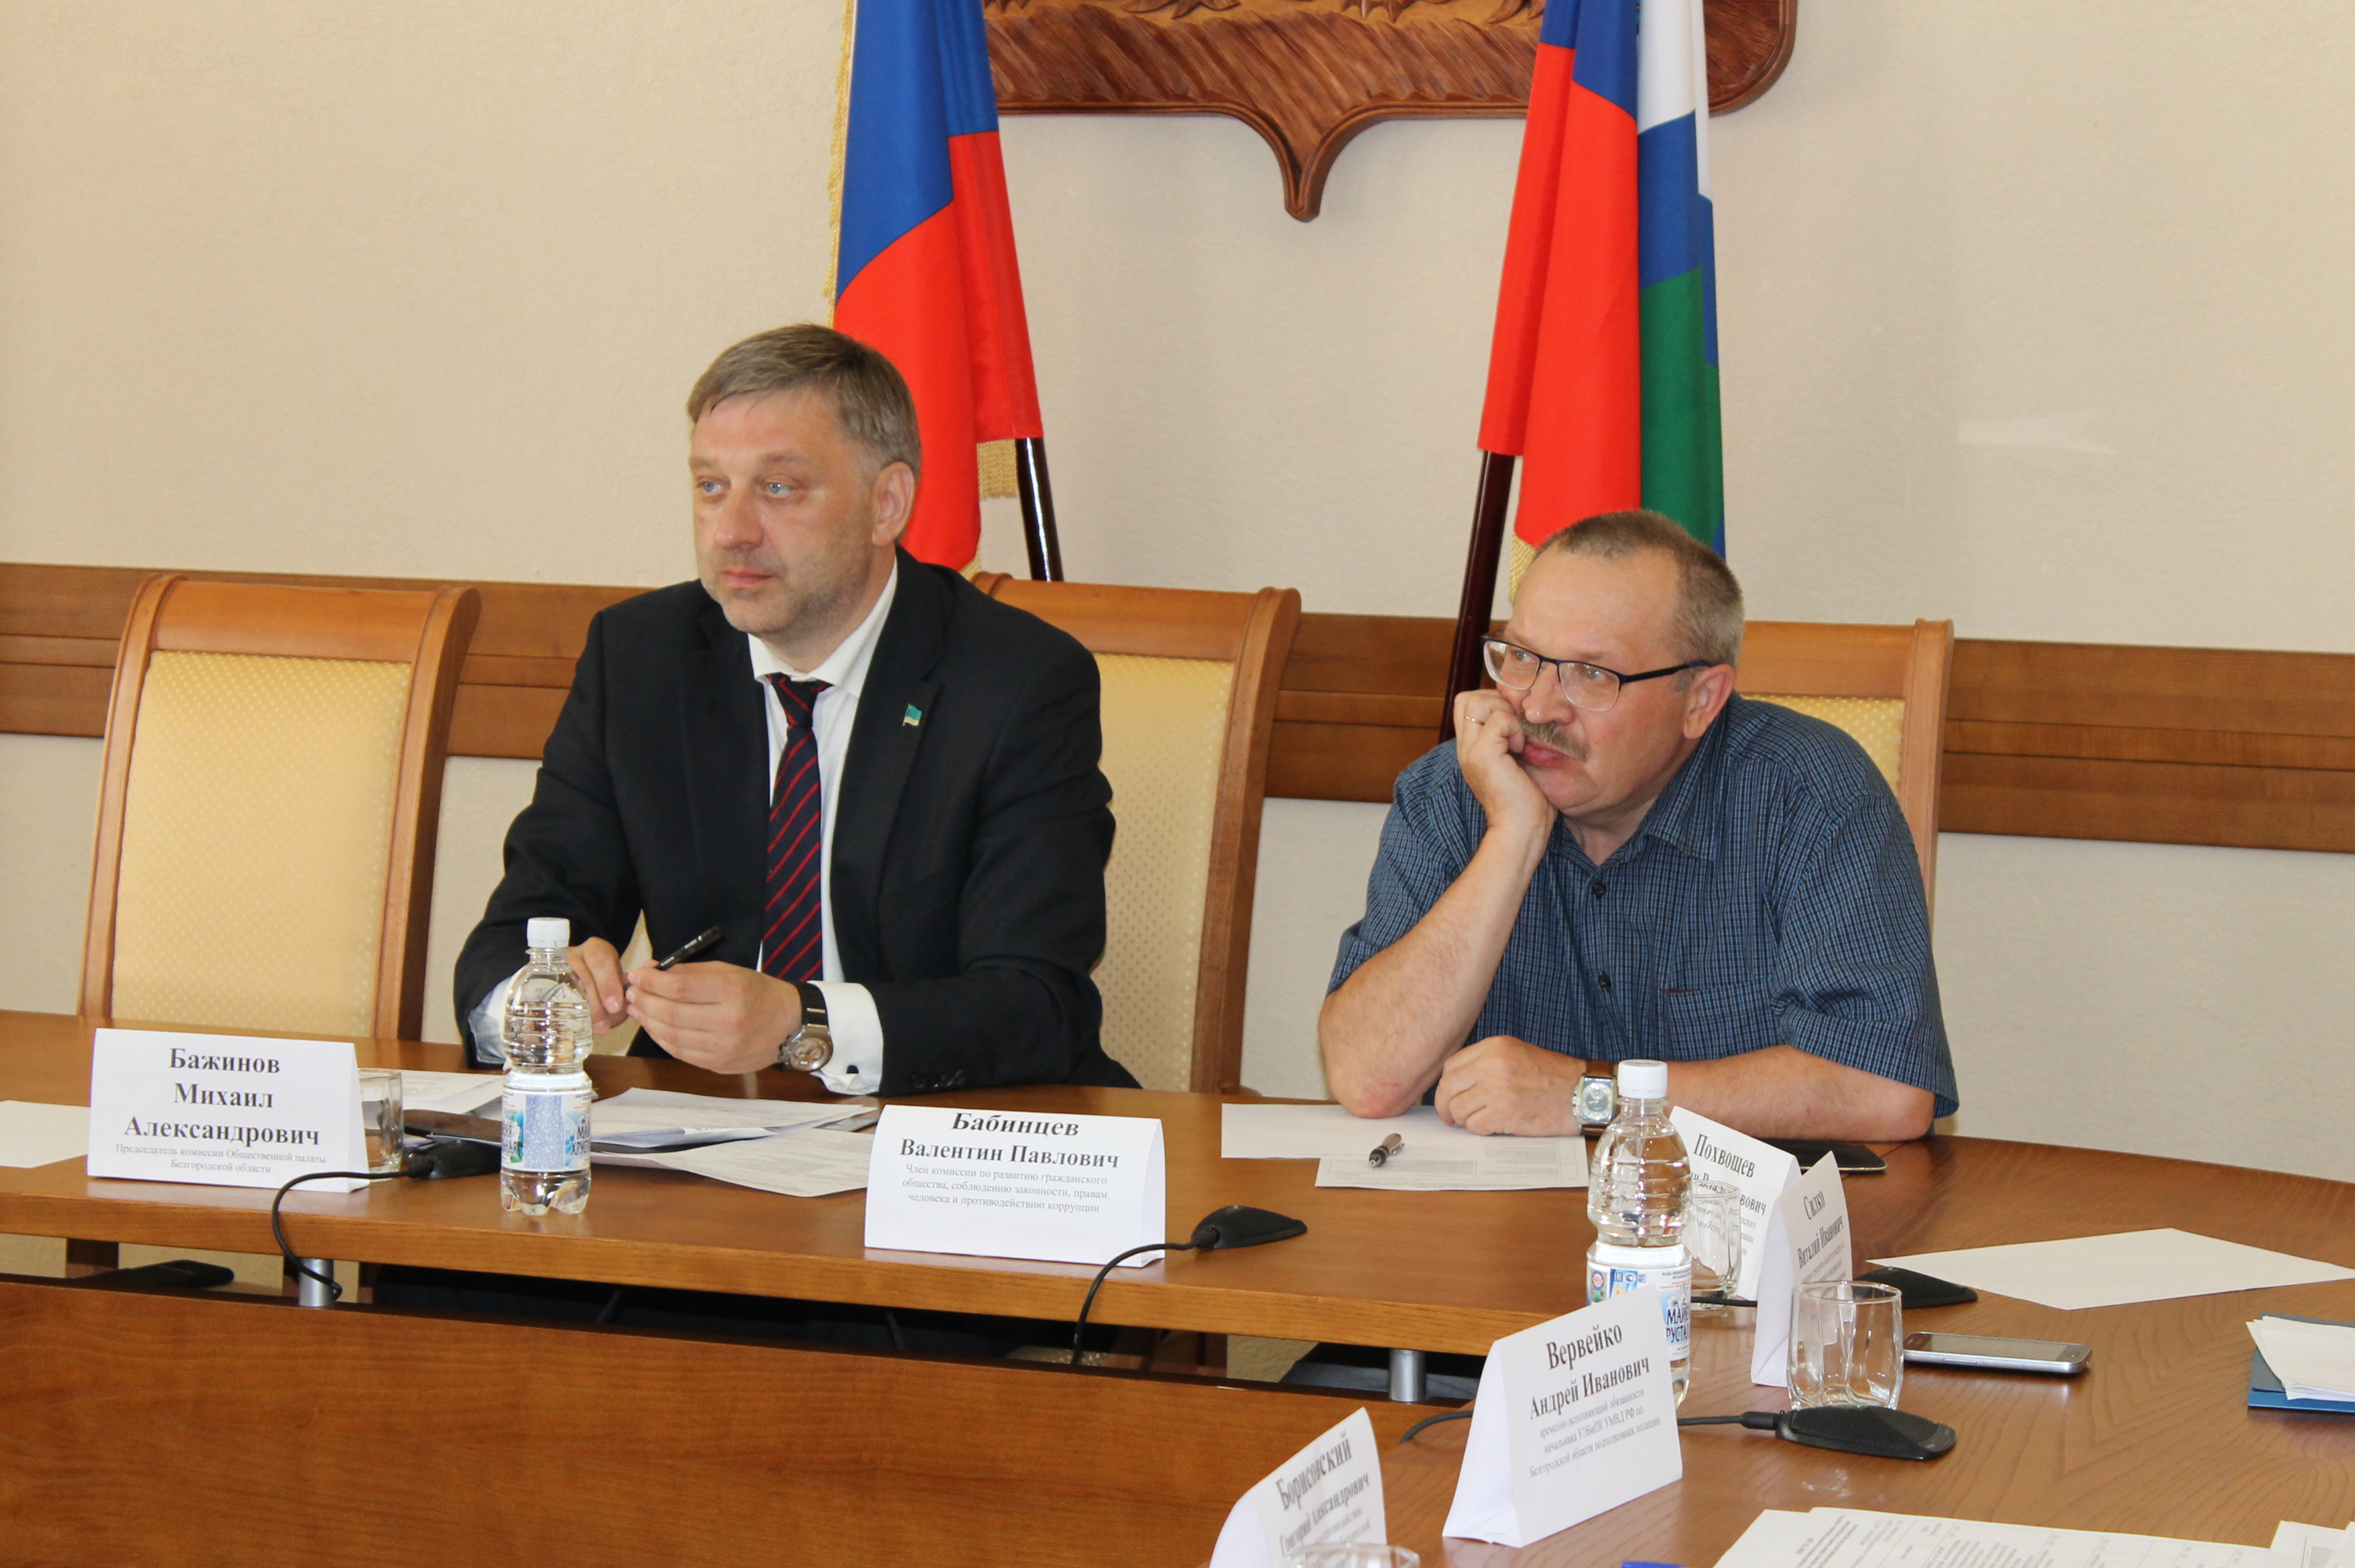 Бажинов михаил александрович белгород свадьба 57